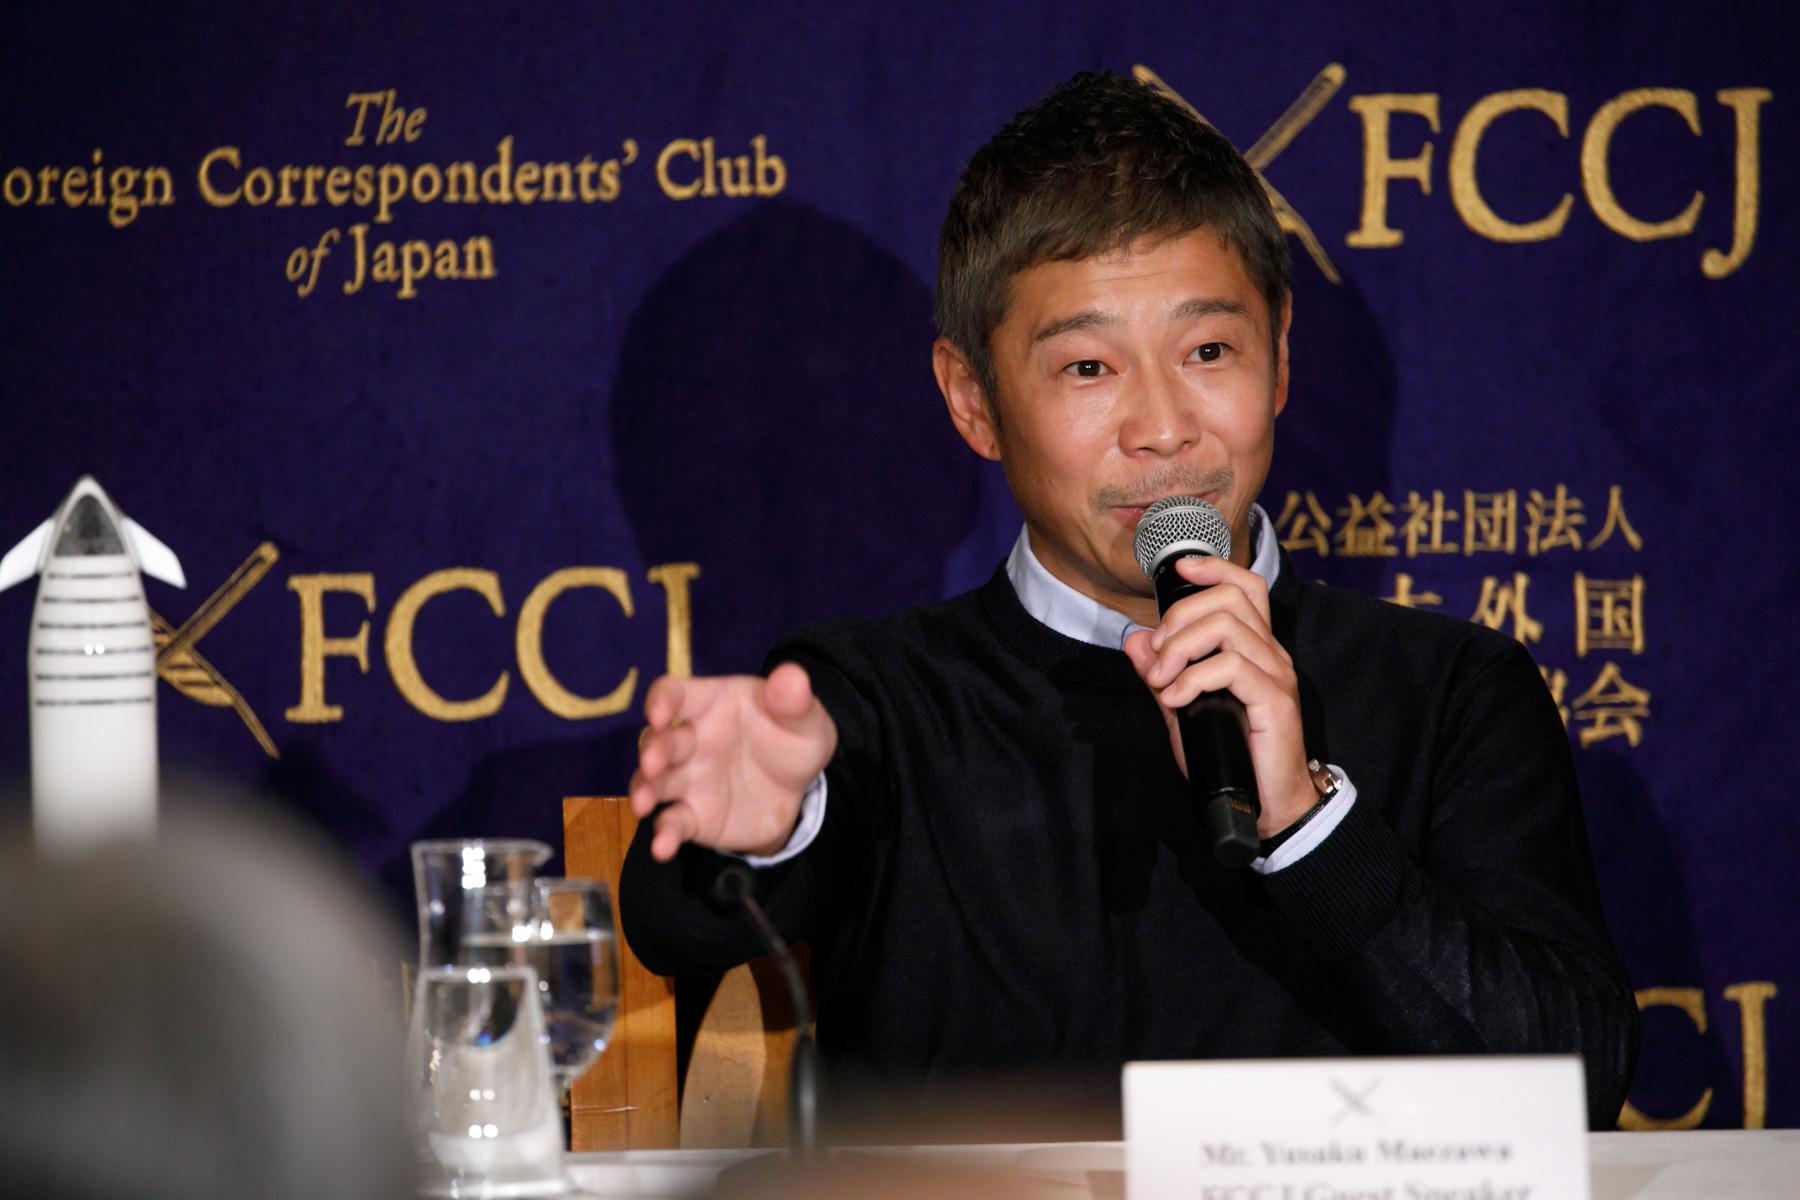 e3ebf6e48a72 「ZOZO離れ」食い止めシフト。前澤社長はアパレルにくすぶる不満解消できるか | BUSINESS INSIDER JAPAN